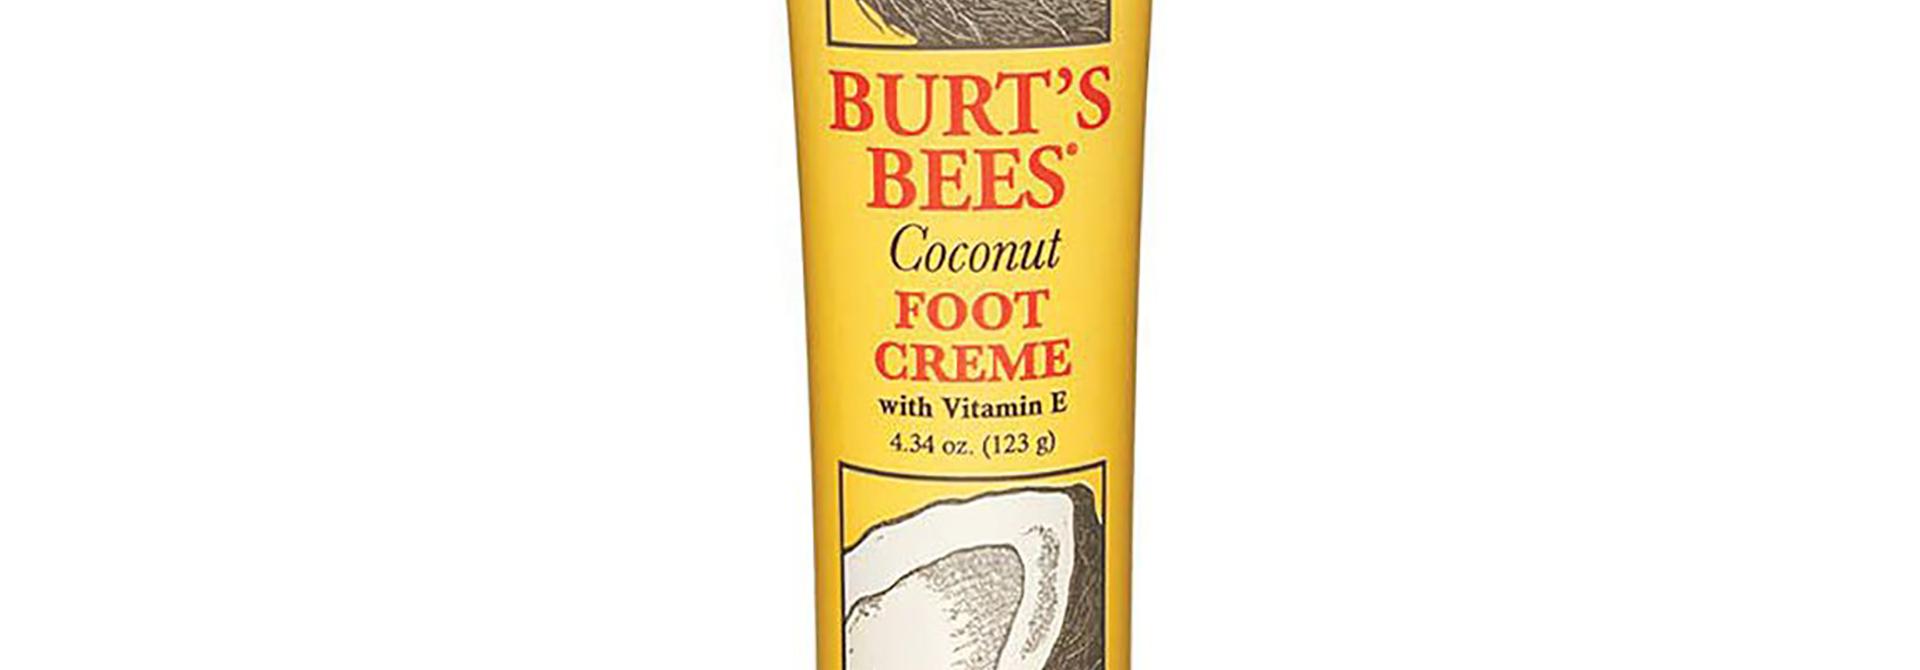 Foot Creme Coconut 4.34 oz.